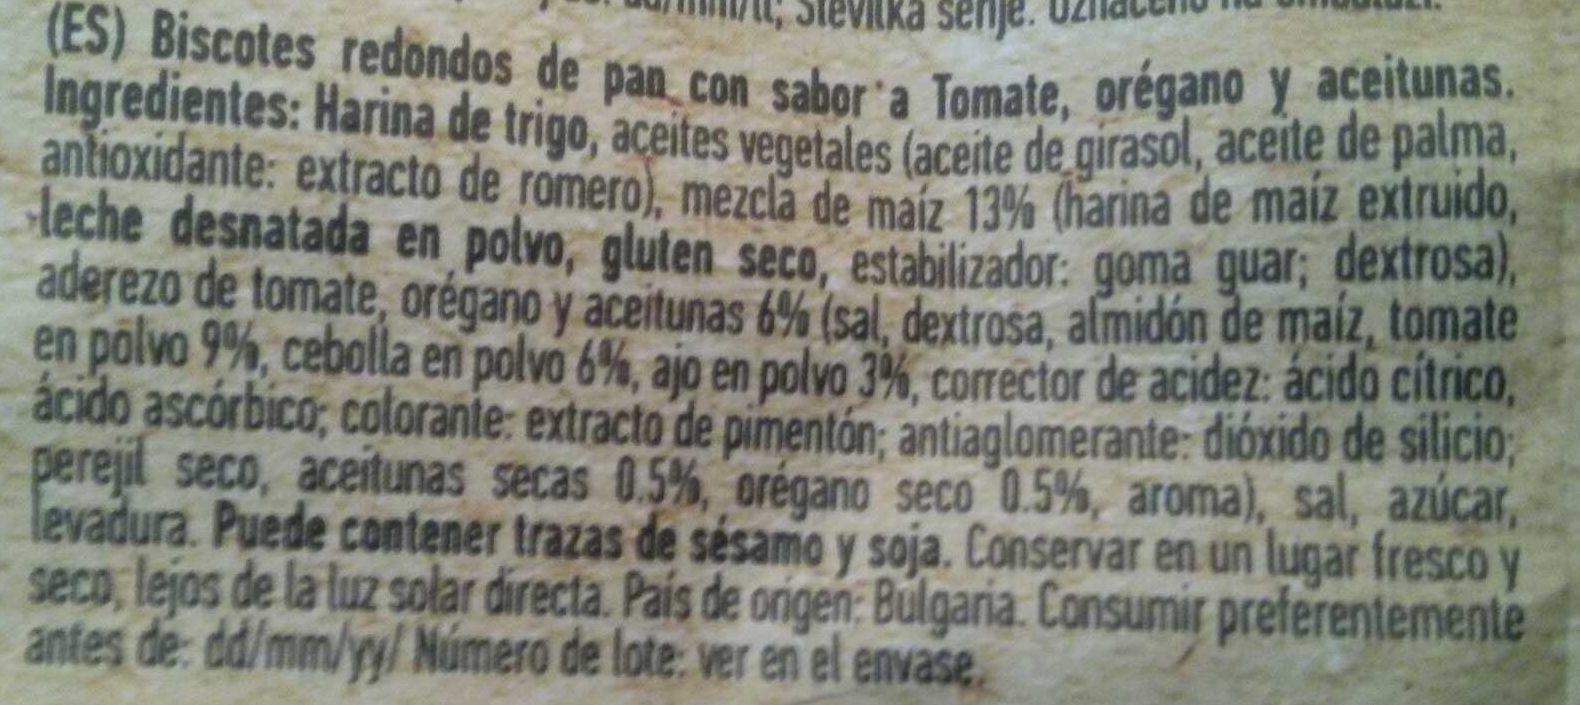 Bruschette bites tomato, olives & oregano - Ingredientes